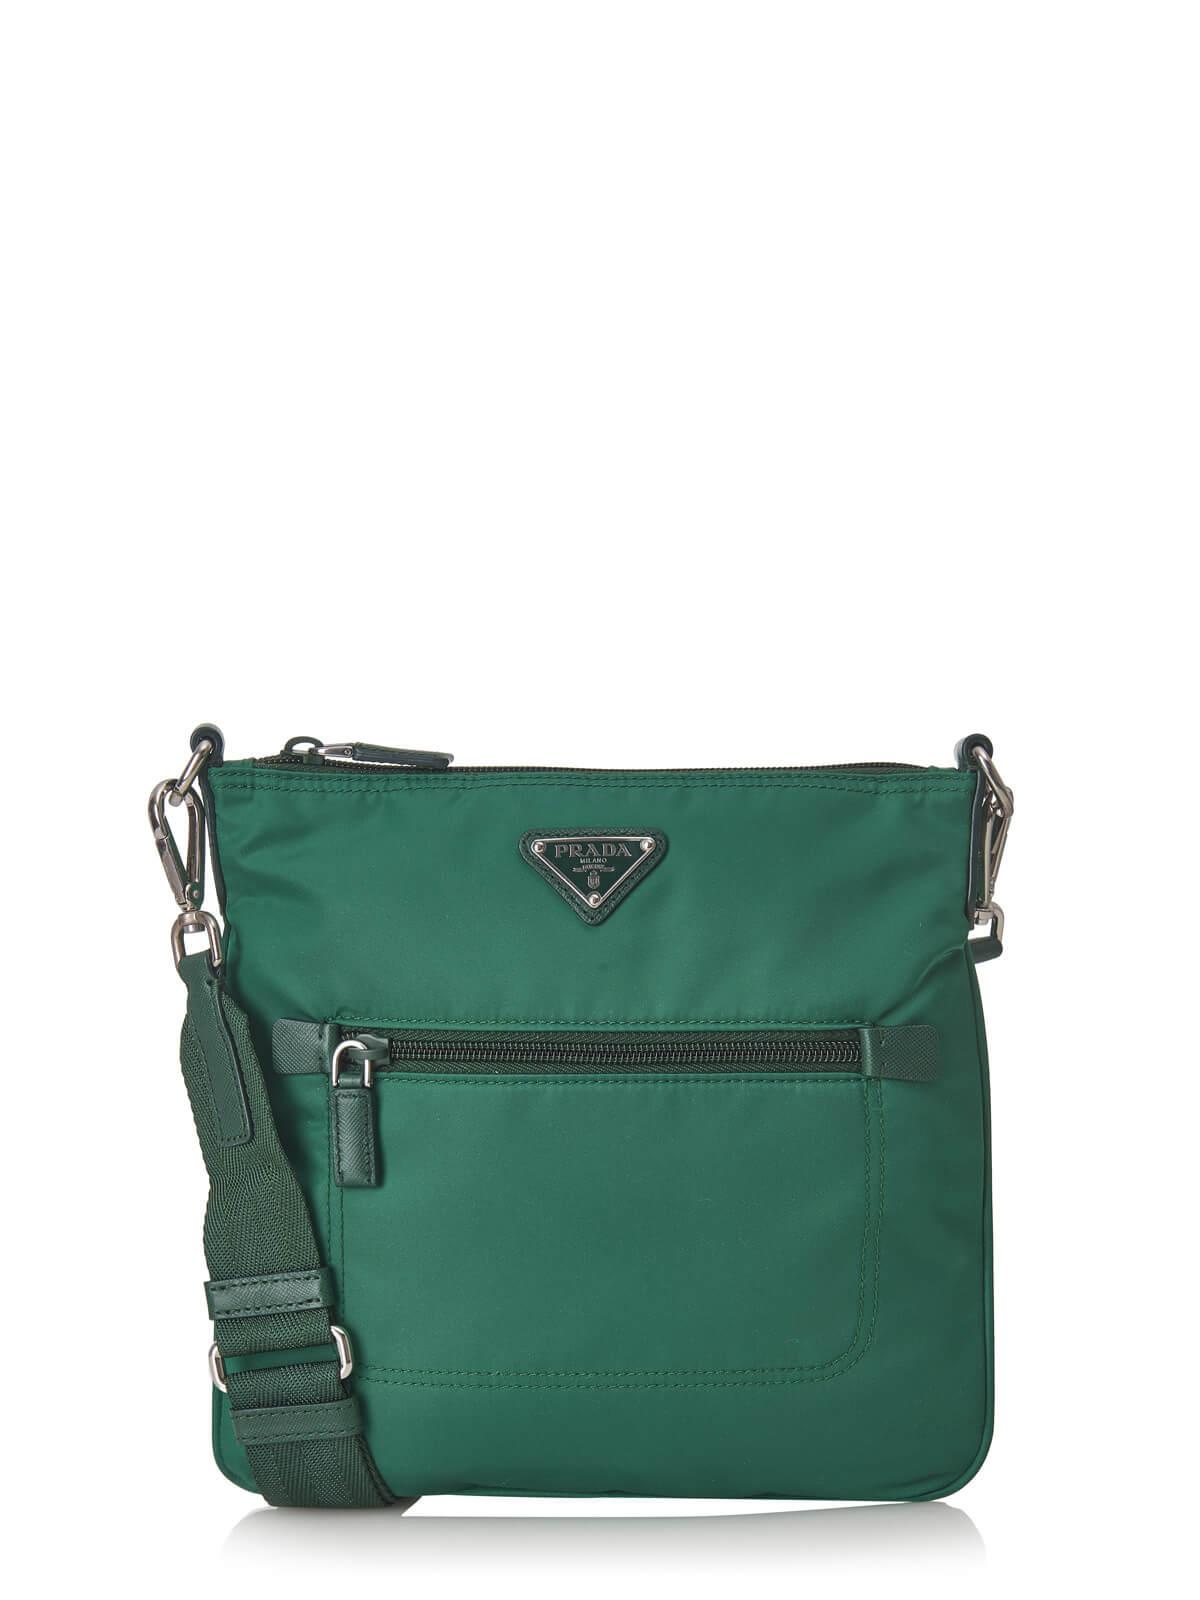 085da0fec10e ... clearance prada bag bandoliera bt0716 fashionesta online shop 55013  97a5a